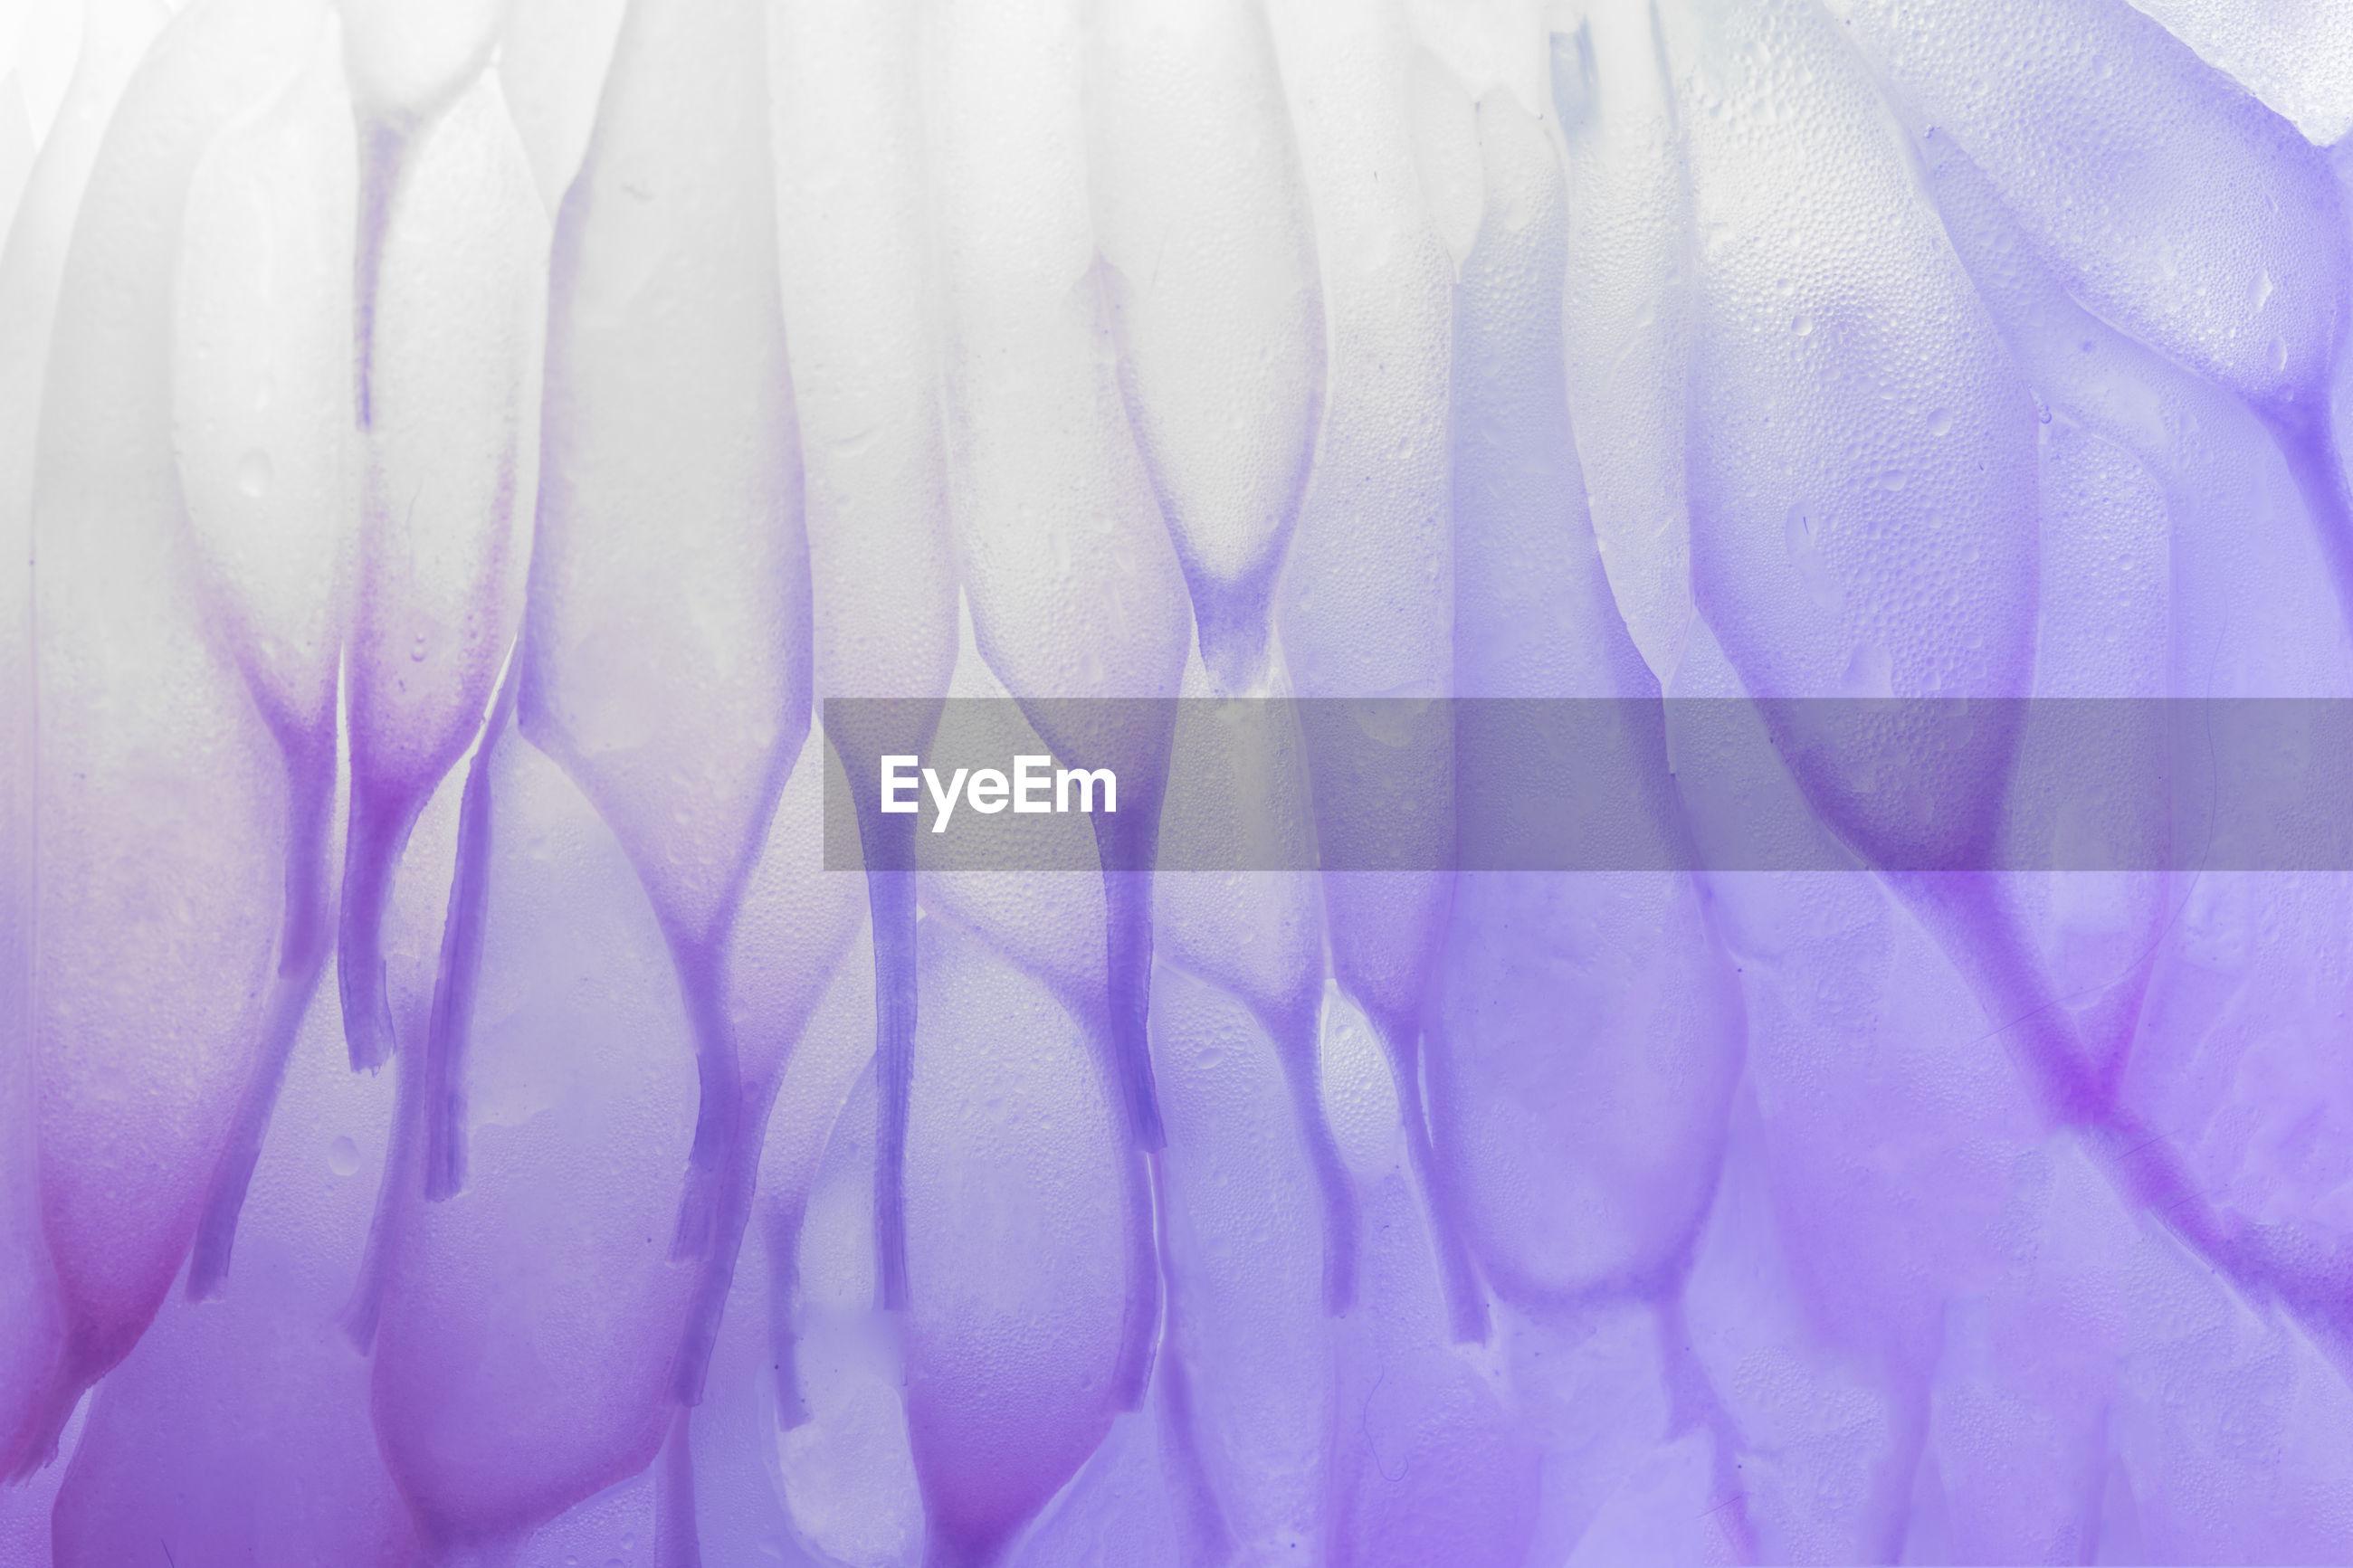 Digital composite image of purple grapefruit flesh